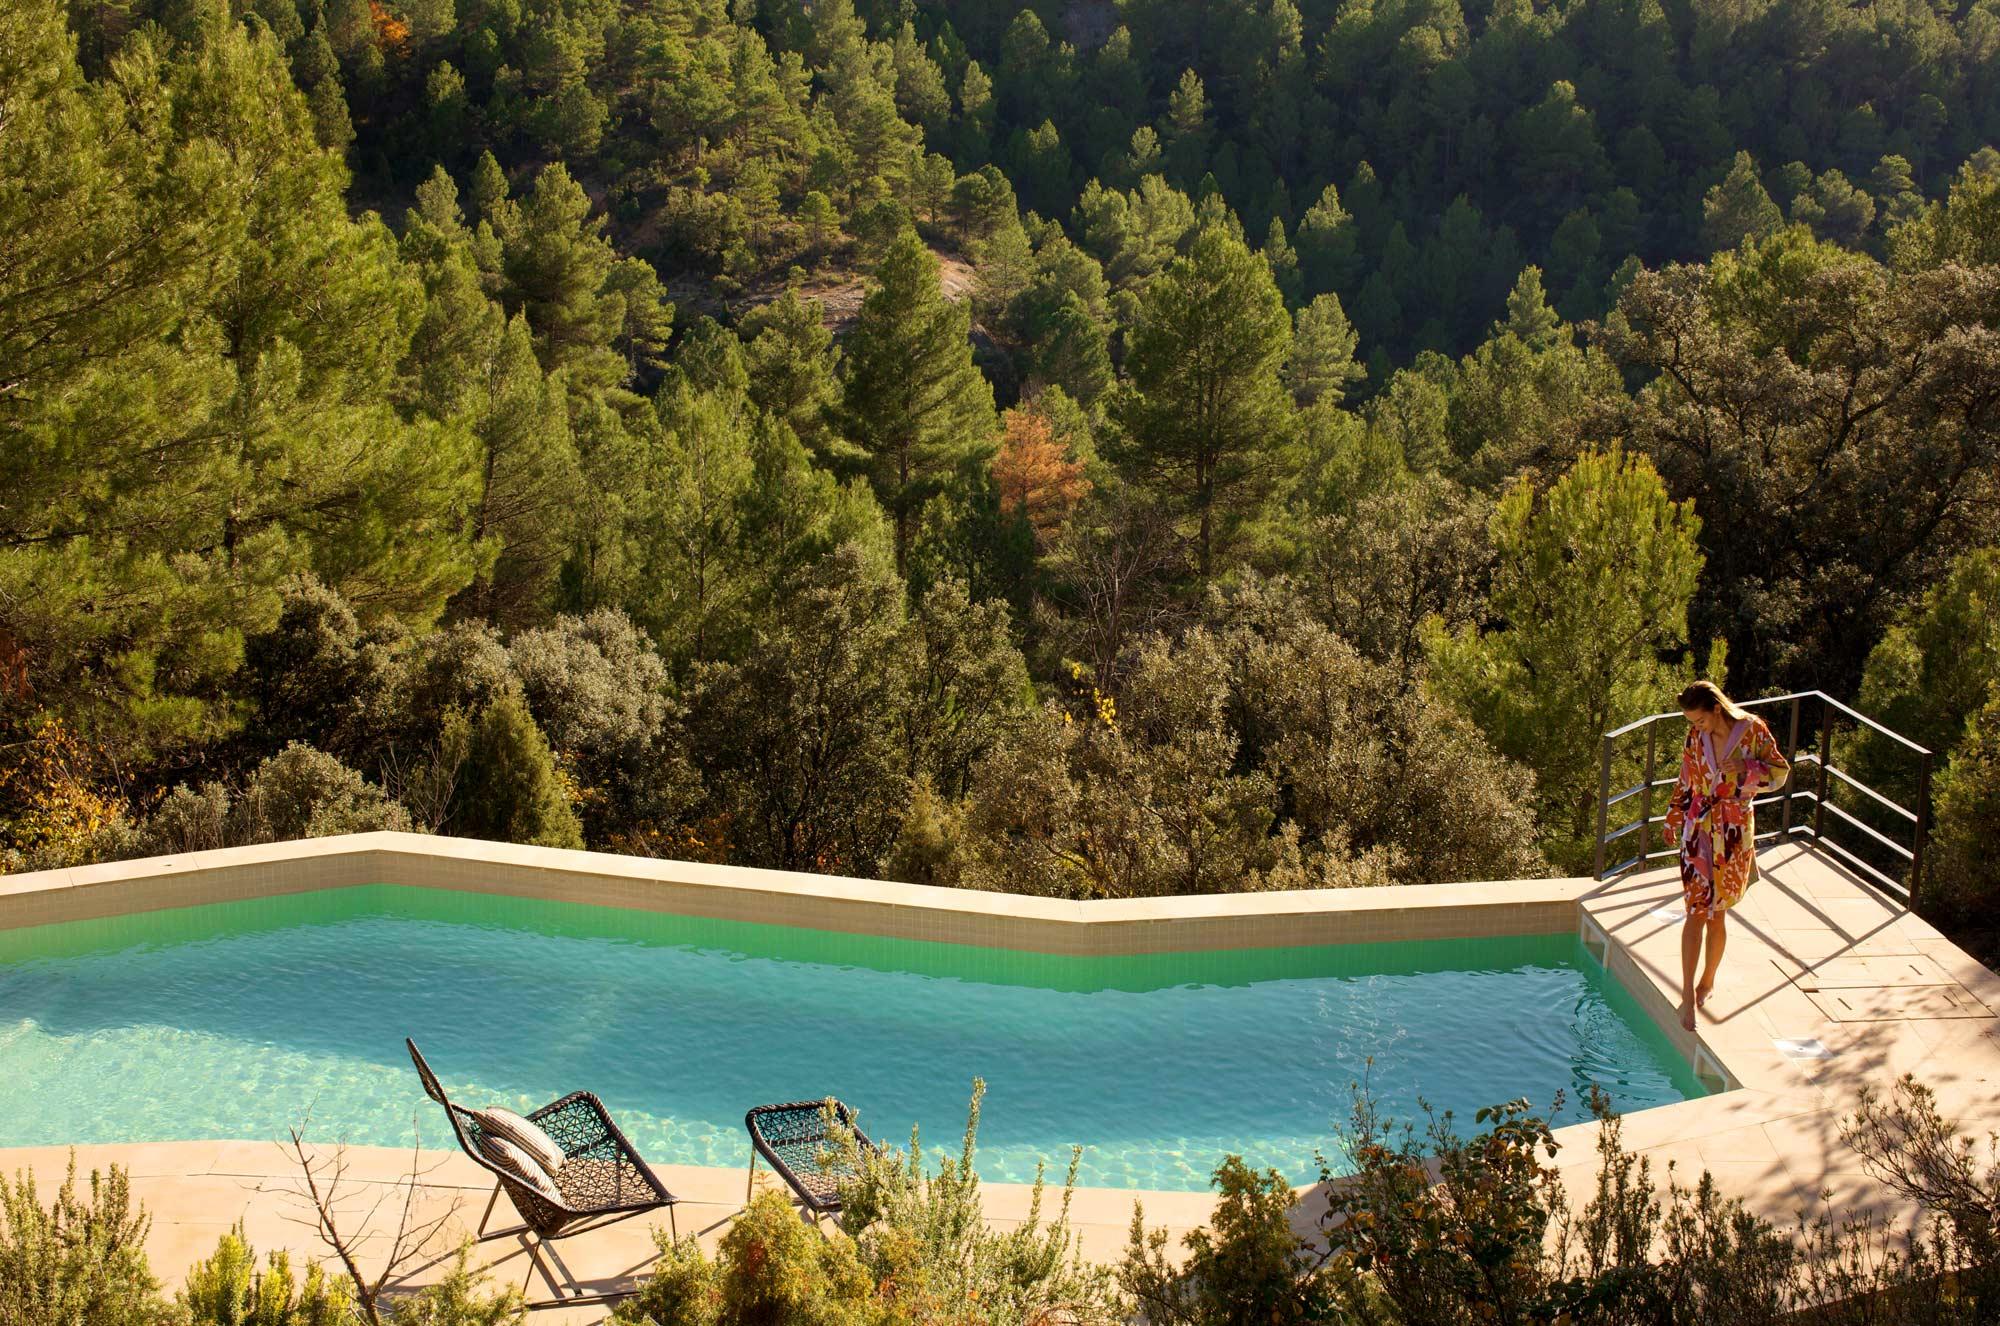 Chic small hotels hotel consolacion teruel spain pool view for Piscina teruel